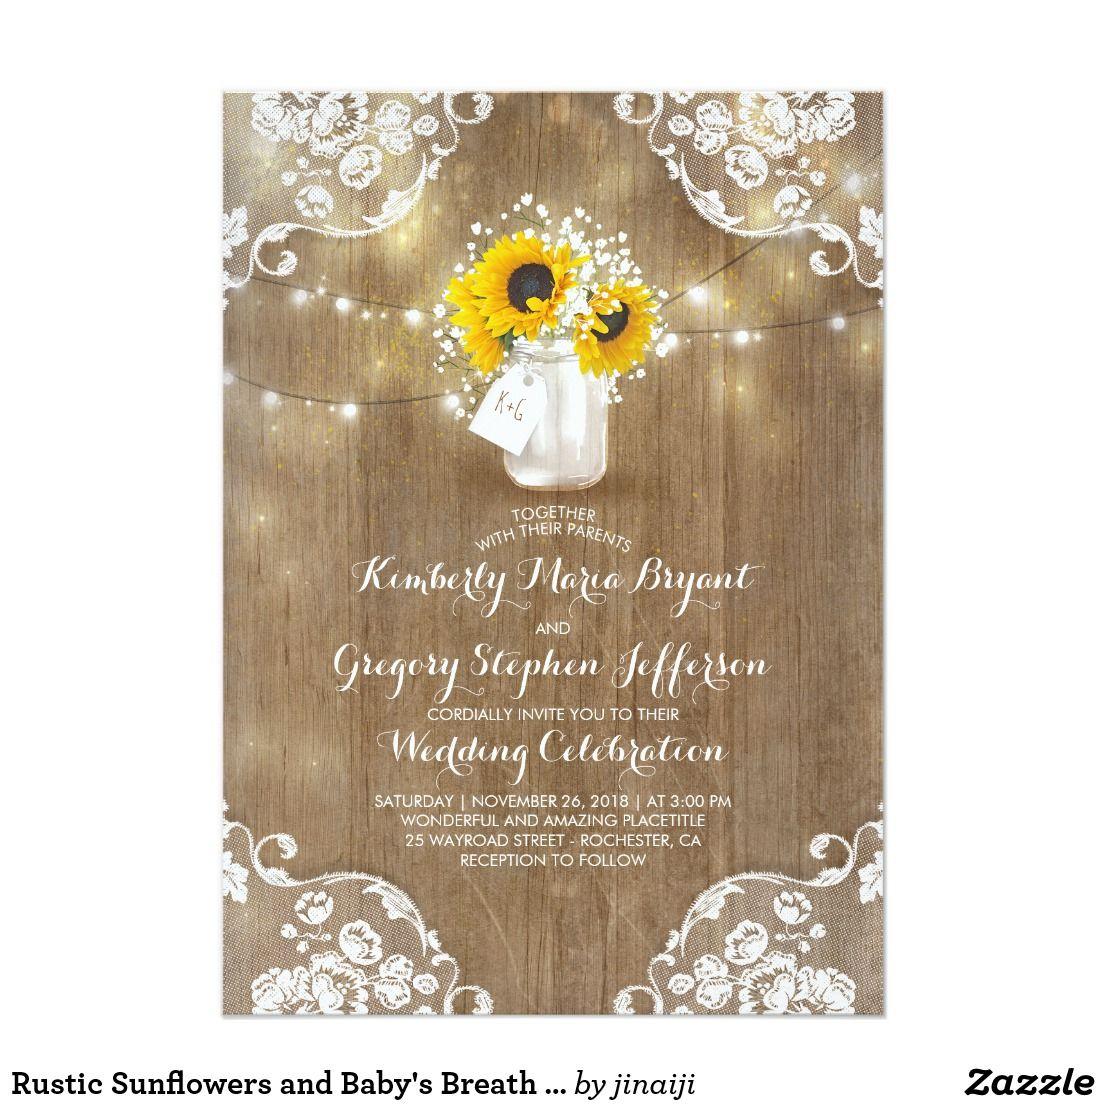 Wedding decorations wood november 2018 Rustic Sunflowers and Babyus Breath Fall Wedding Invitation